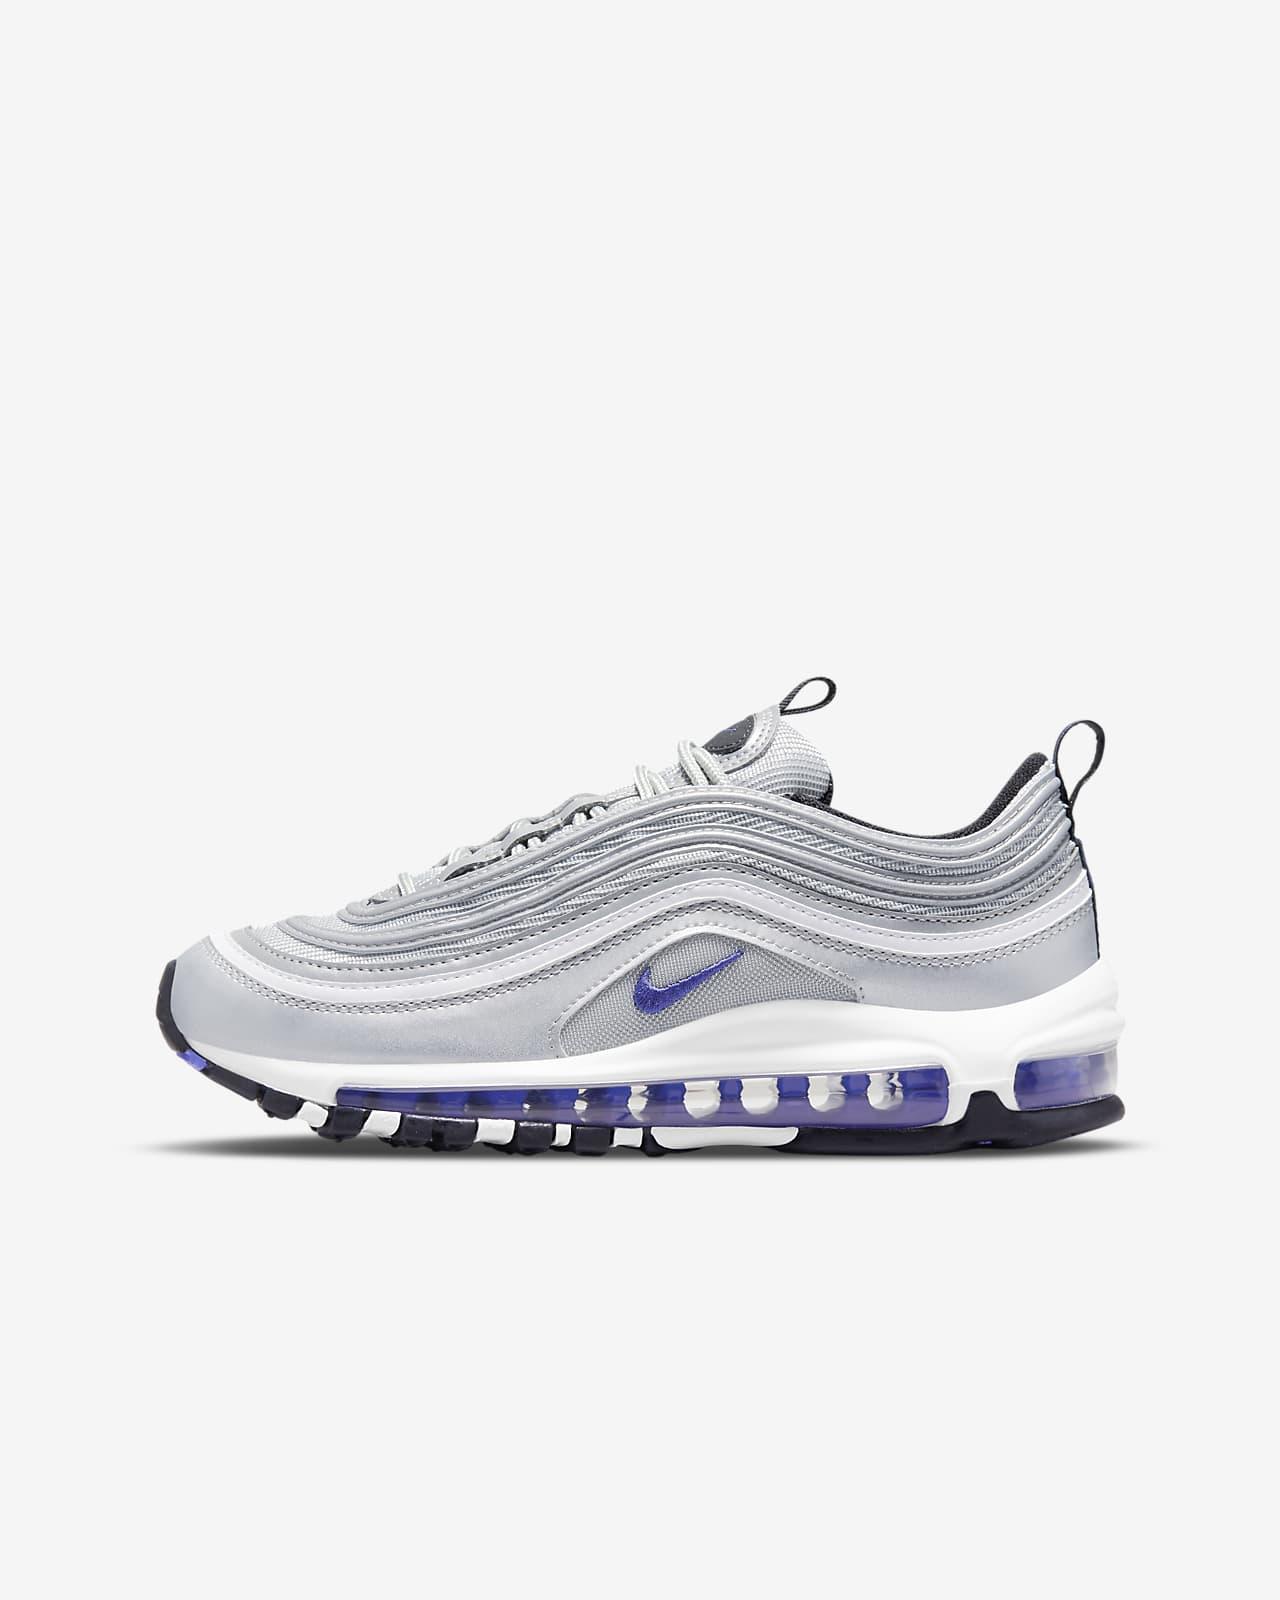 Nike Air Max 97 Schuh für ältere Kinder